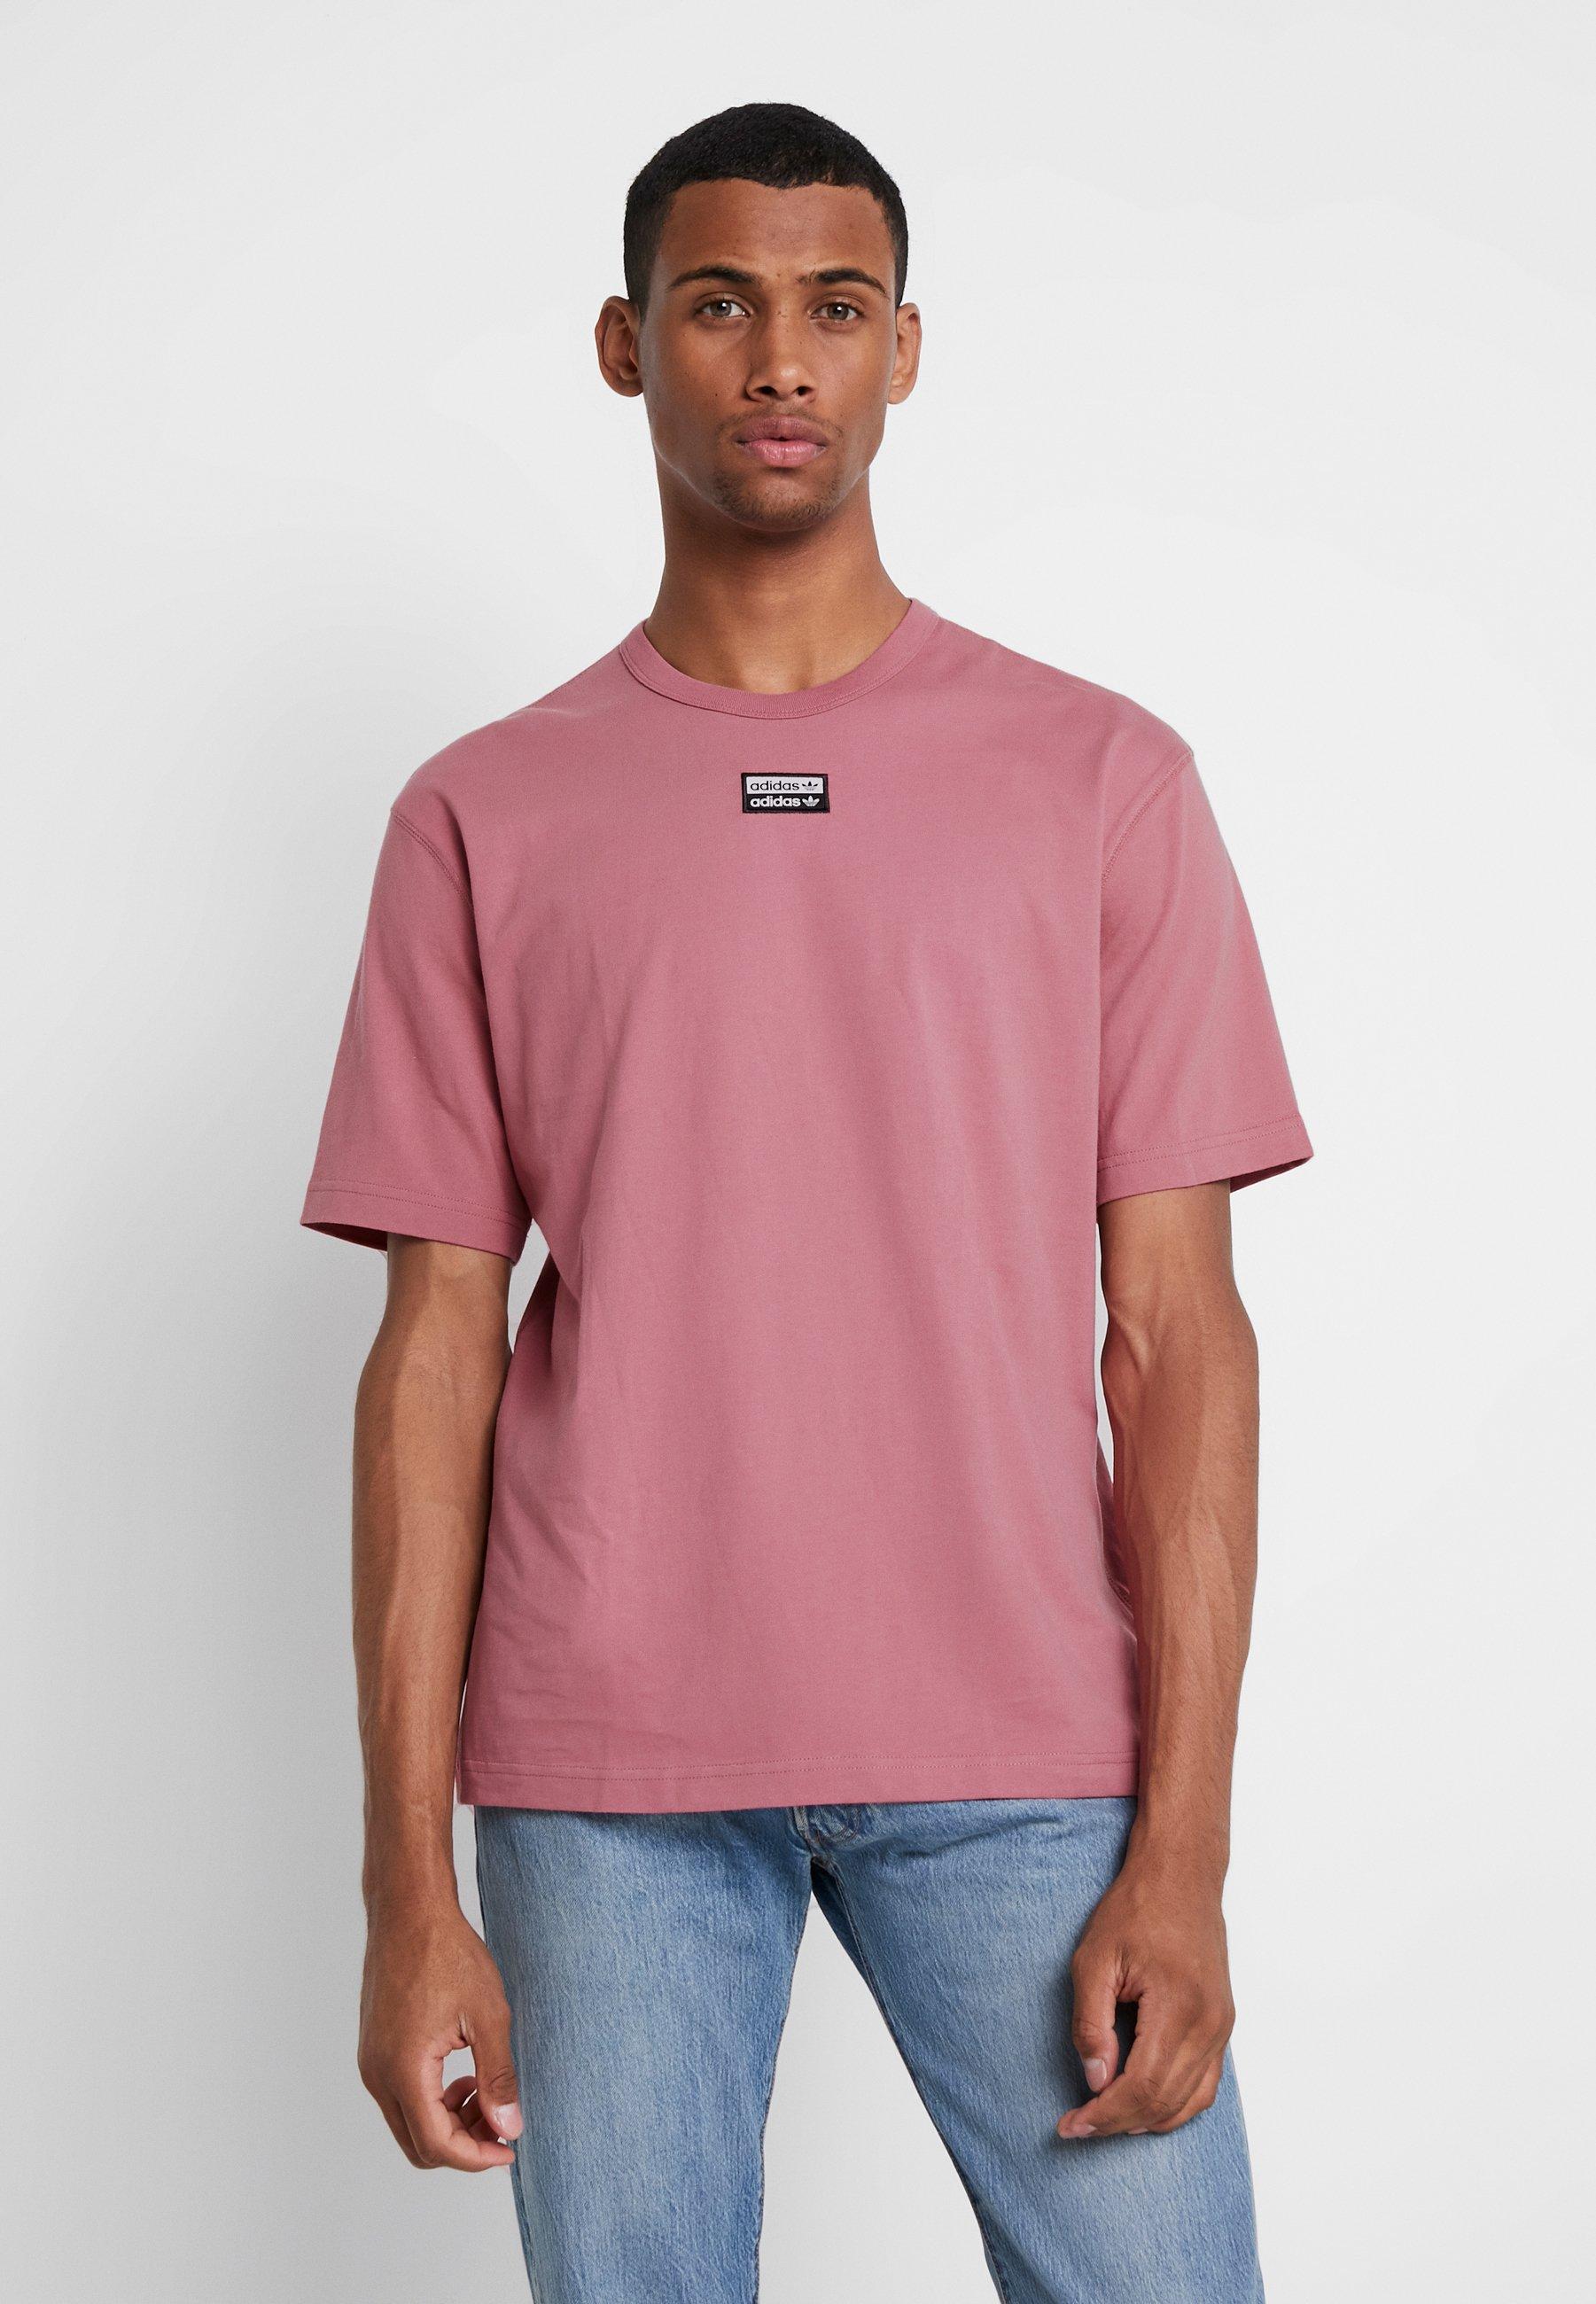 Your Adidas Trace TeeT Maroon Reveal Originals Voice shirt Basique 1lKTFJc3